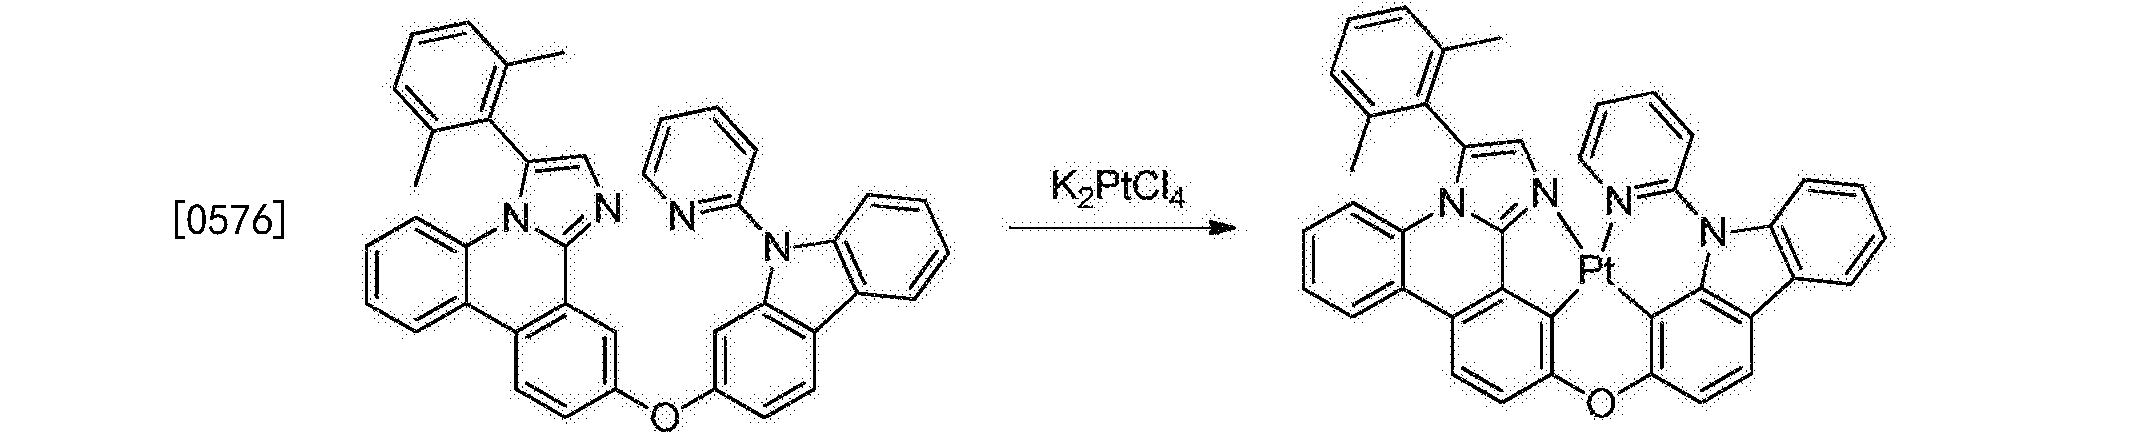 Figure CN106749425AD01641